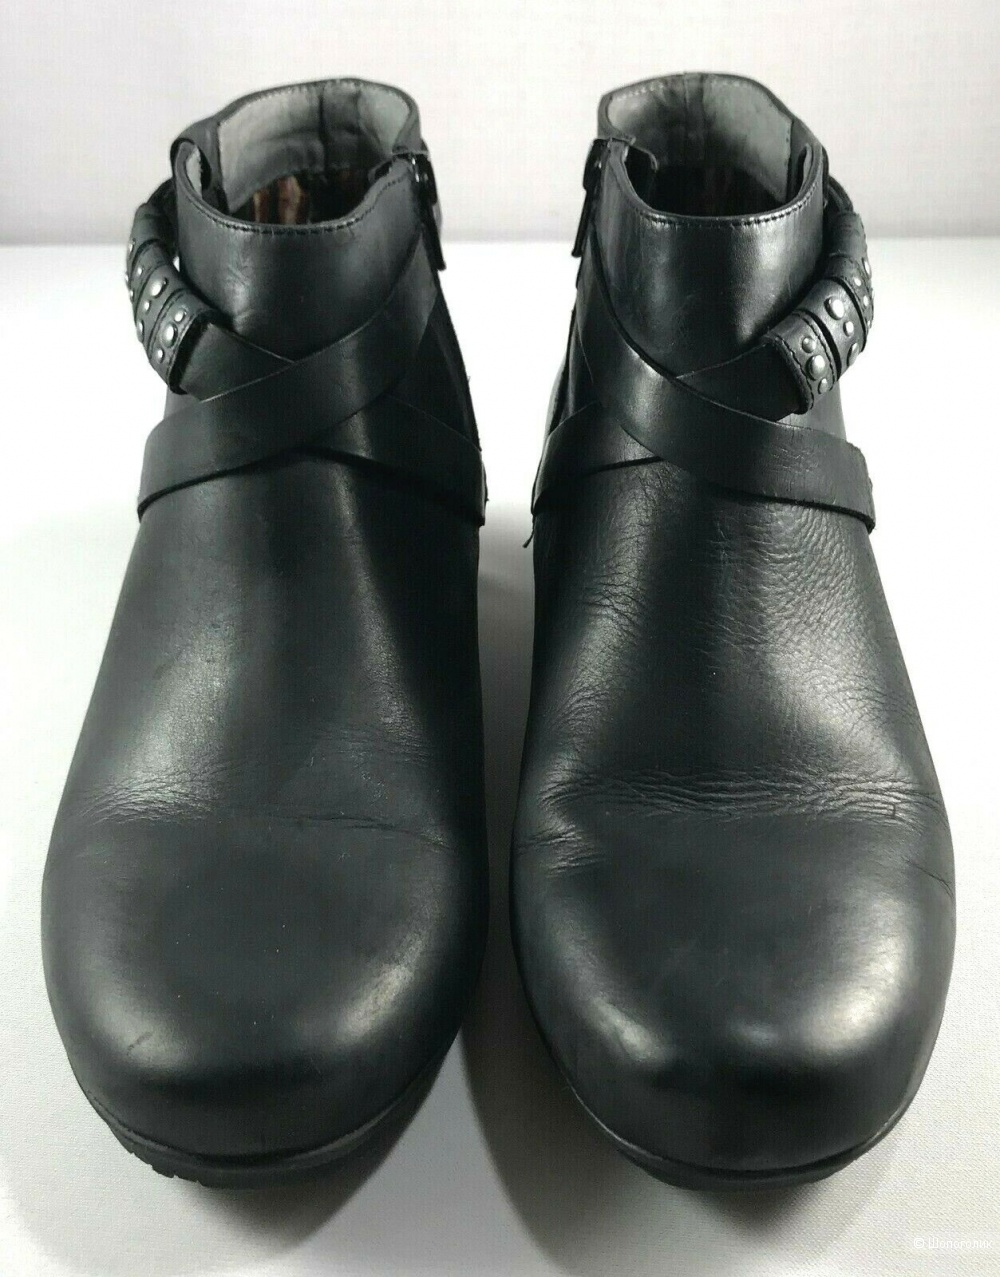 Кожаные ботинки Abeo bio system размер 10